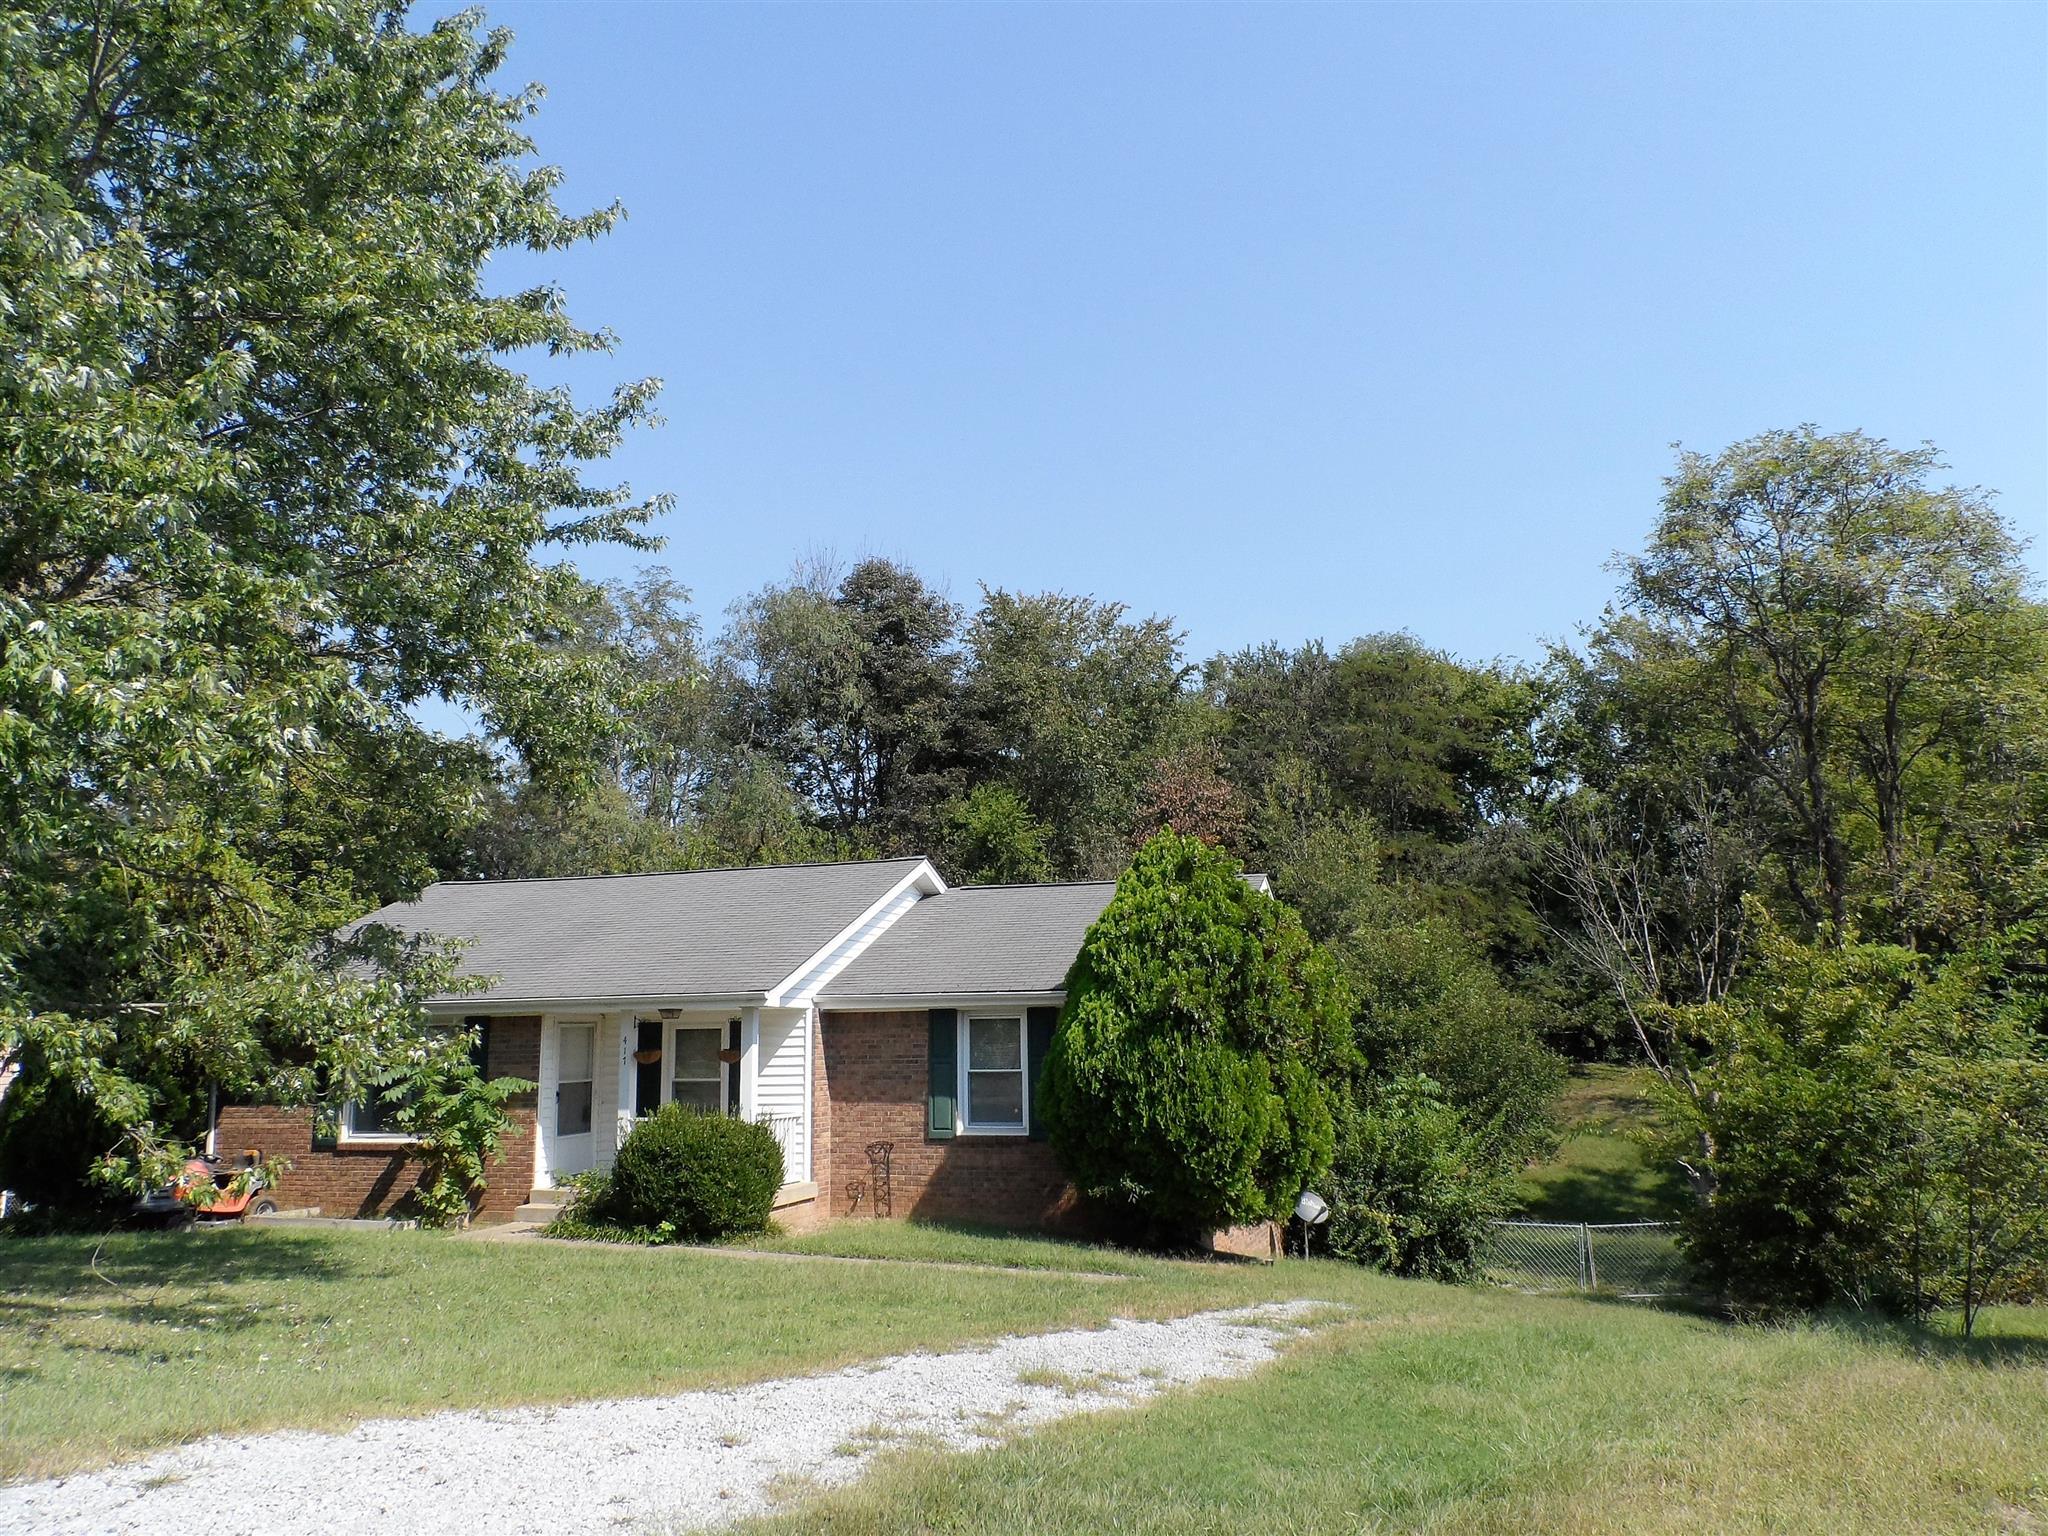 417 Beasley Dr, Clarksville, TN 37042